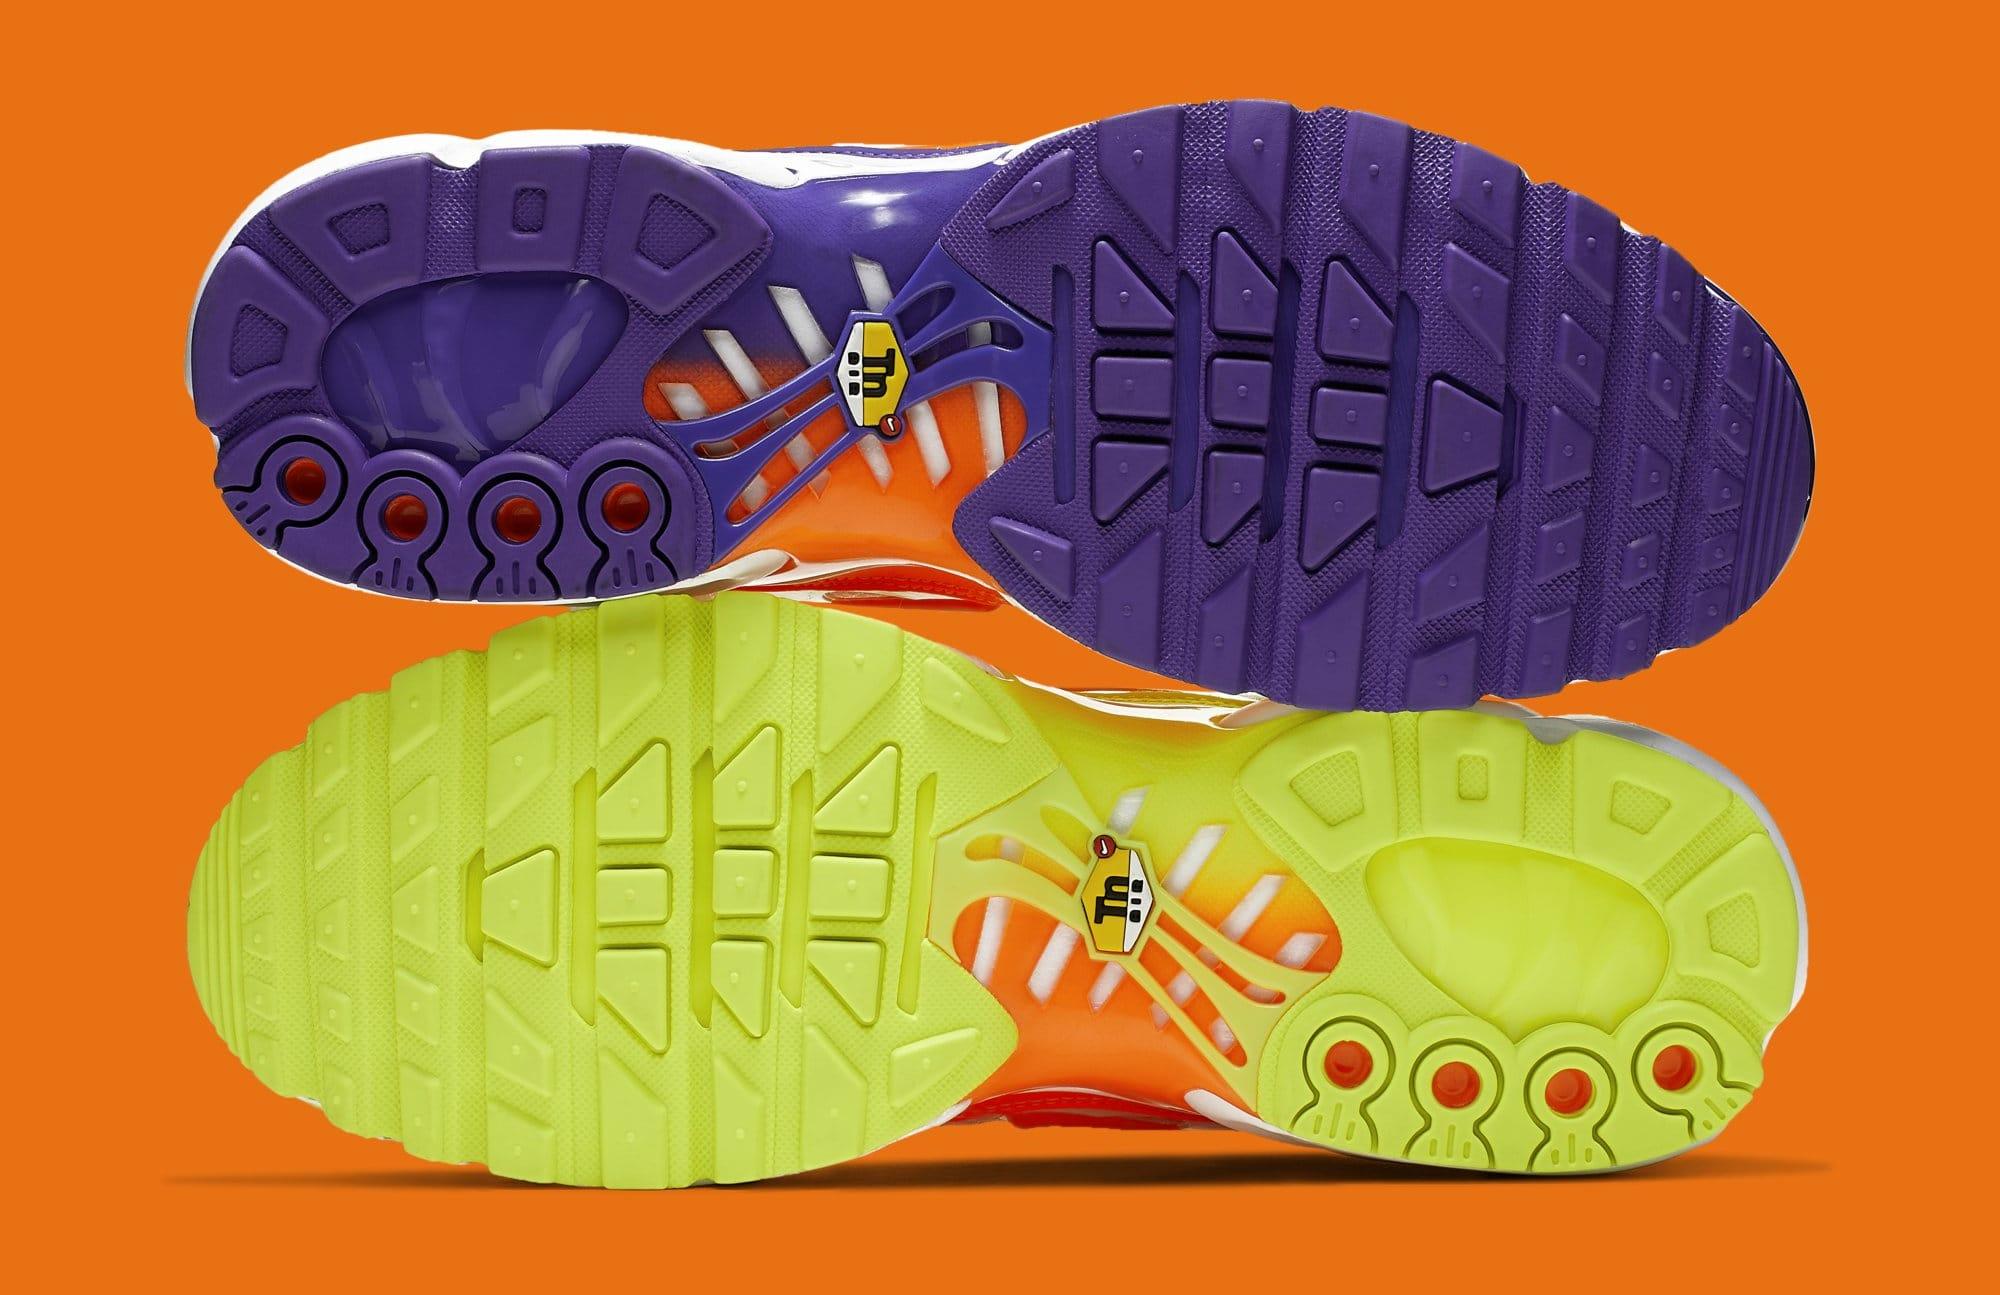 5f8c248abe Image via Nike Nike Air Max Plus 'Color Flip/White' CI5925-531 (Bottom)